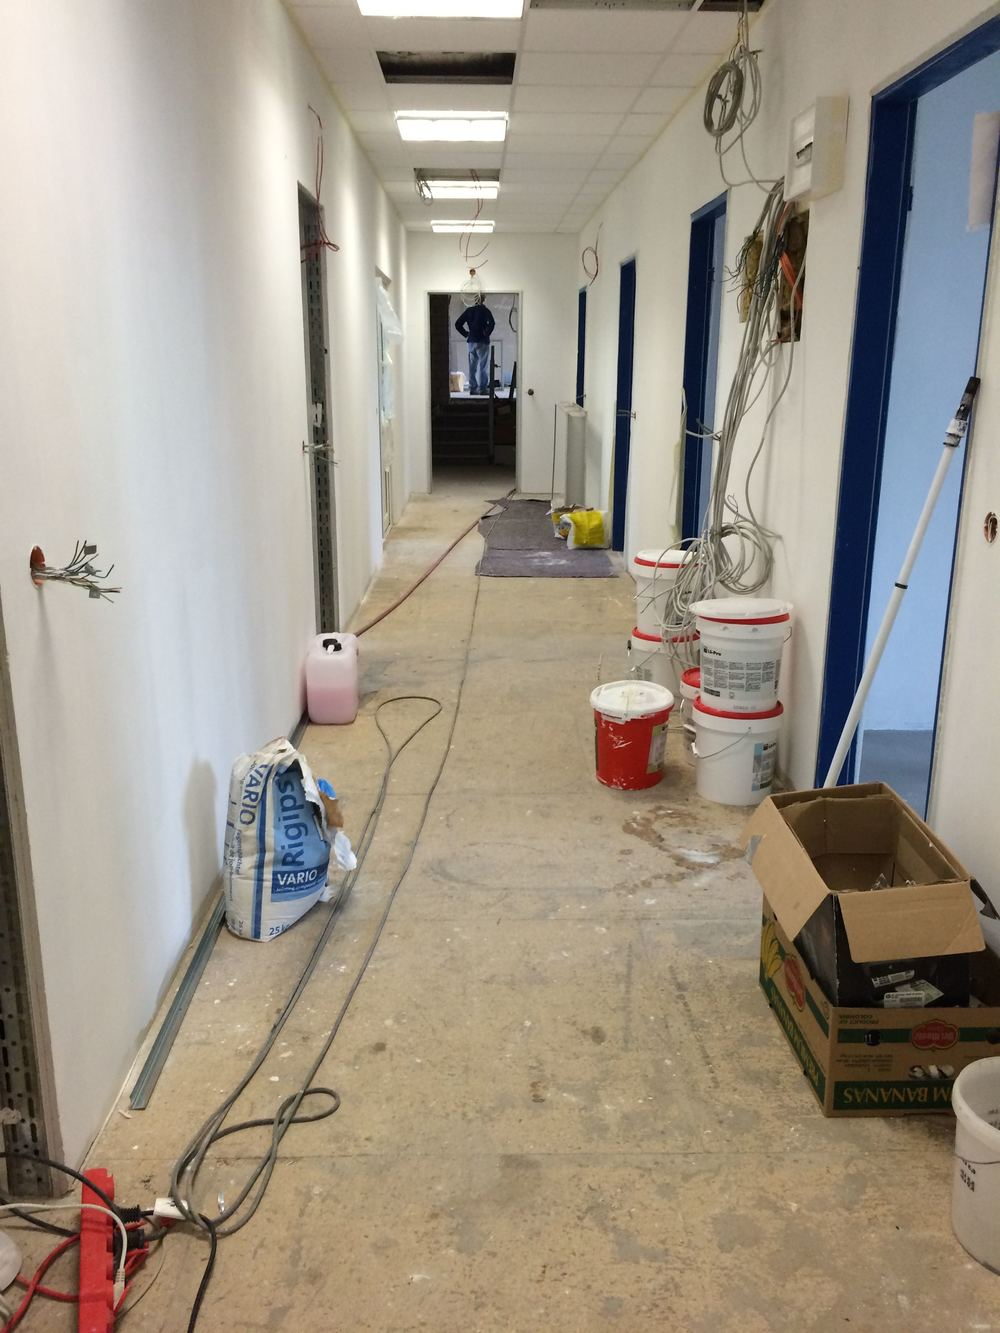 The office hallway